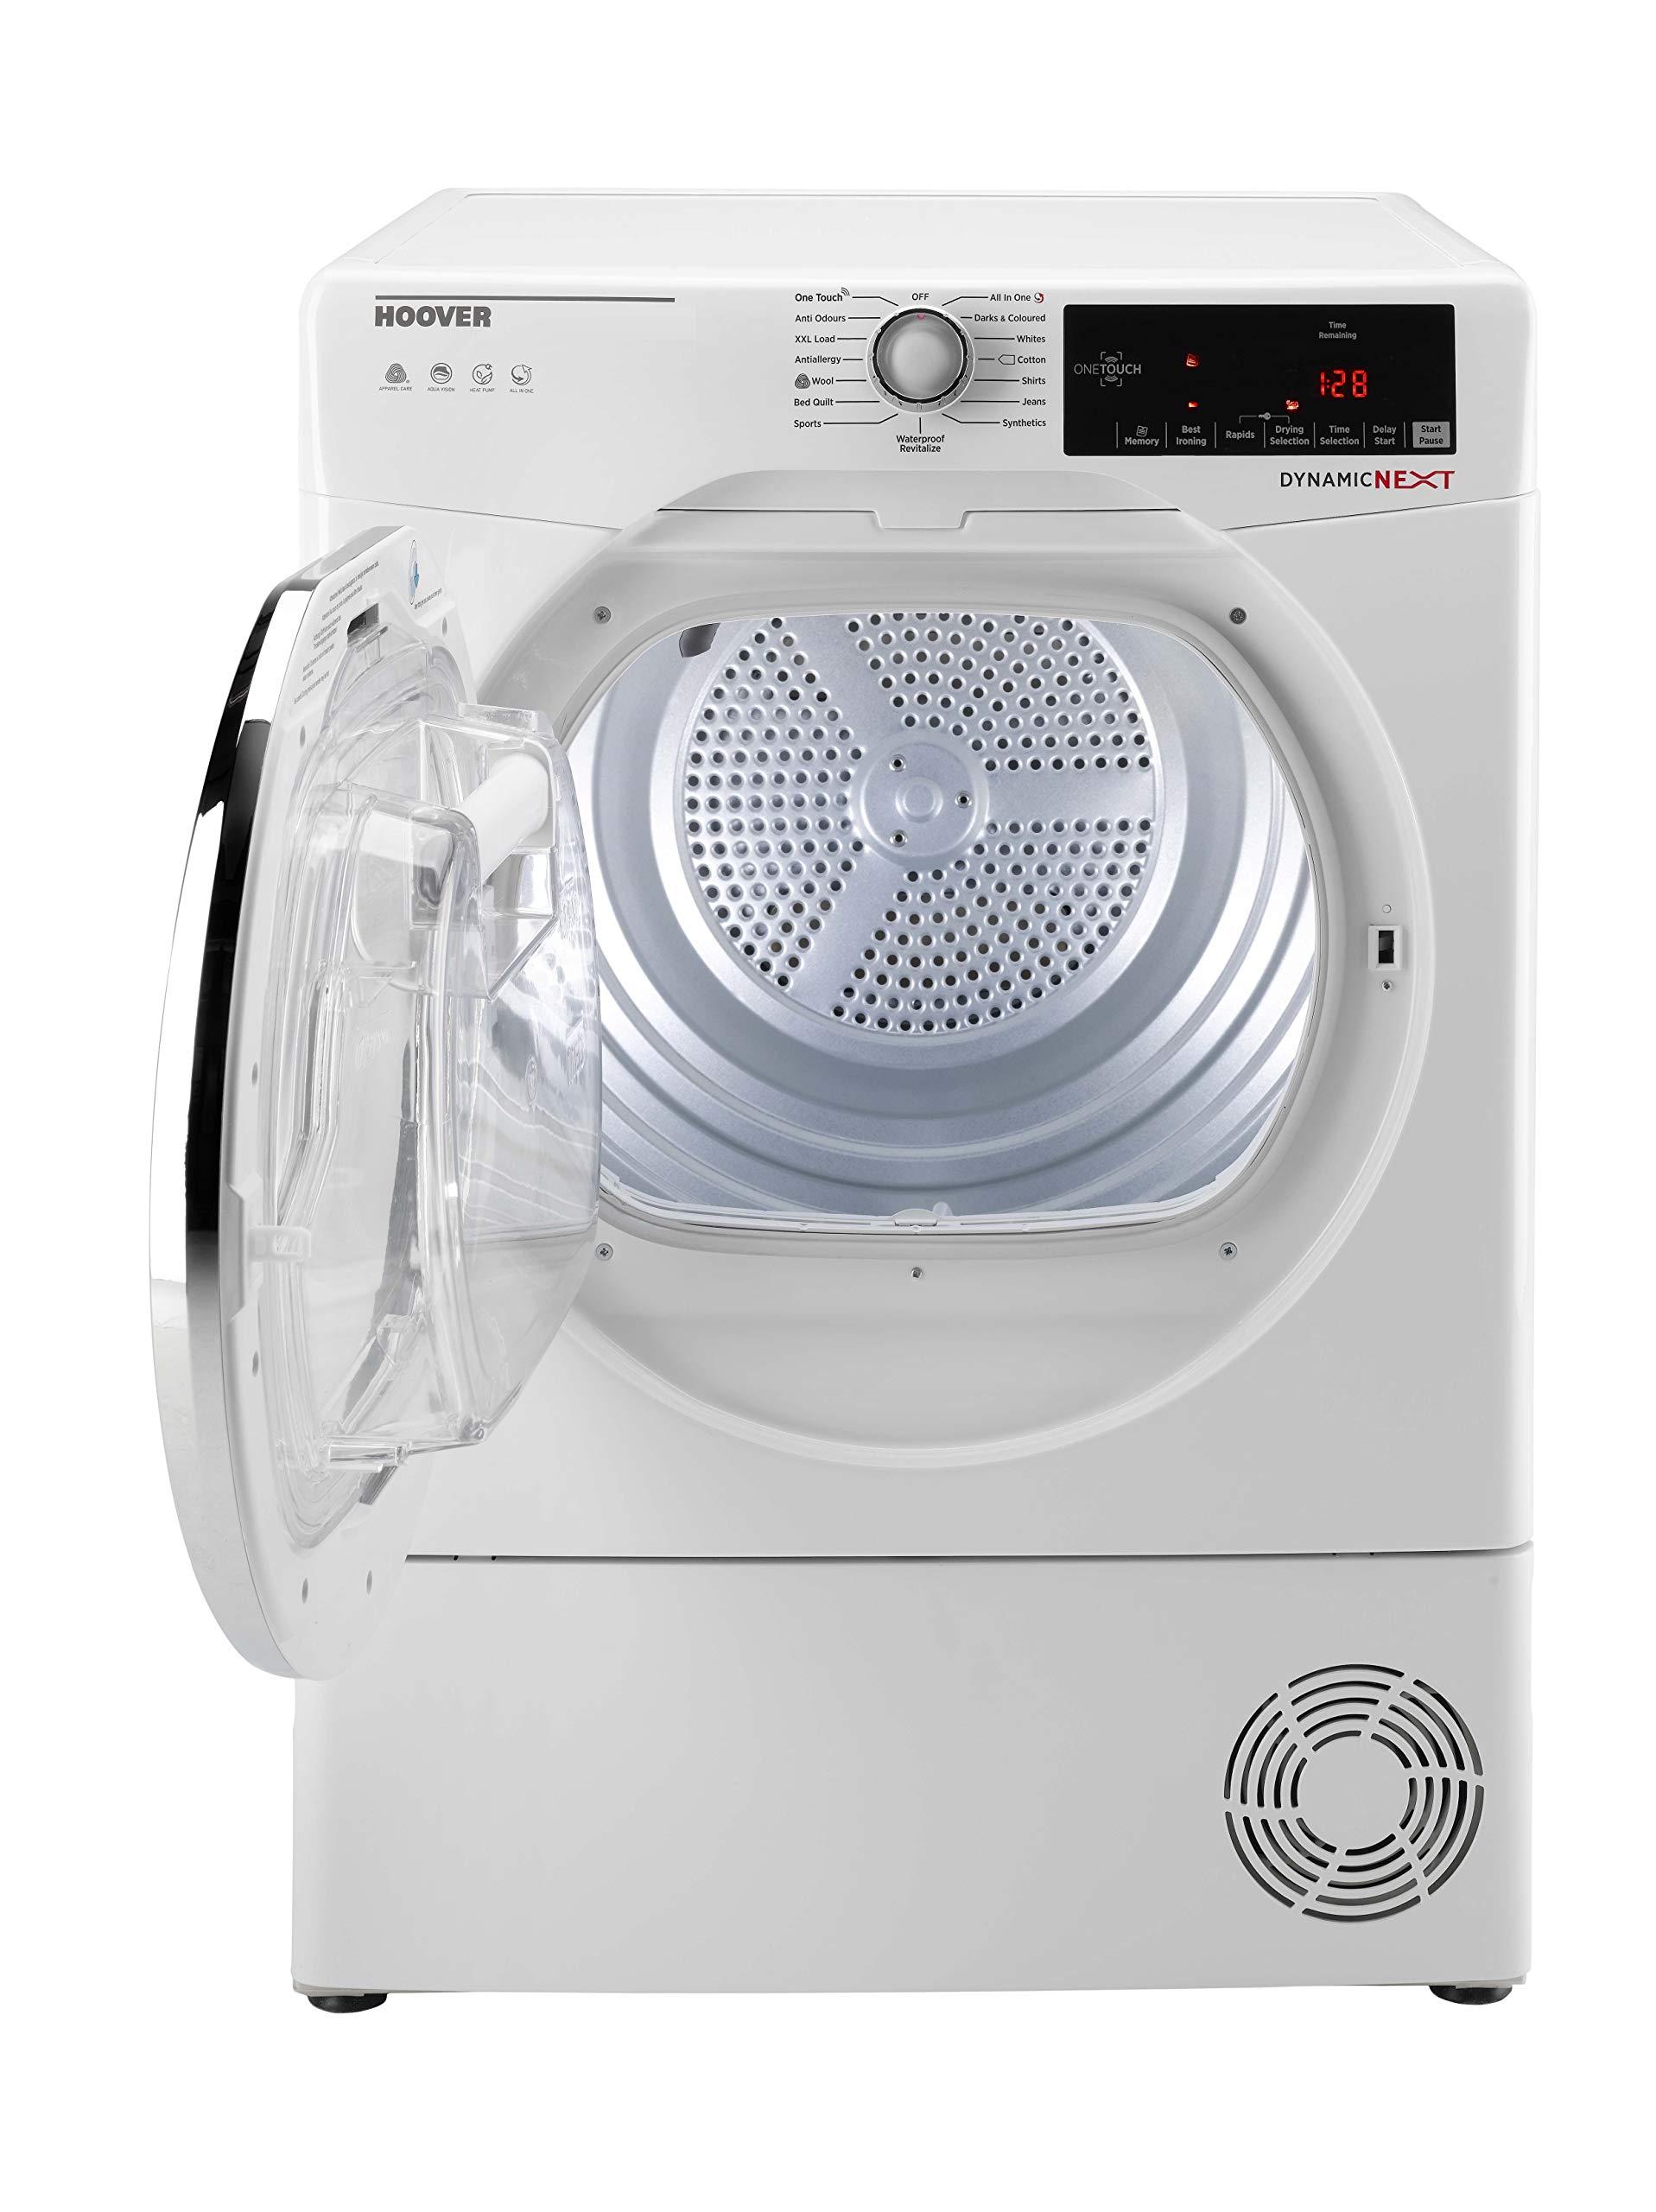 As Direct Ltd TM Hotpoint Indesit Bomba de goma para secadora